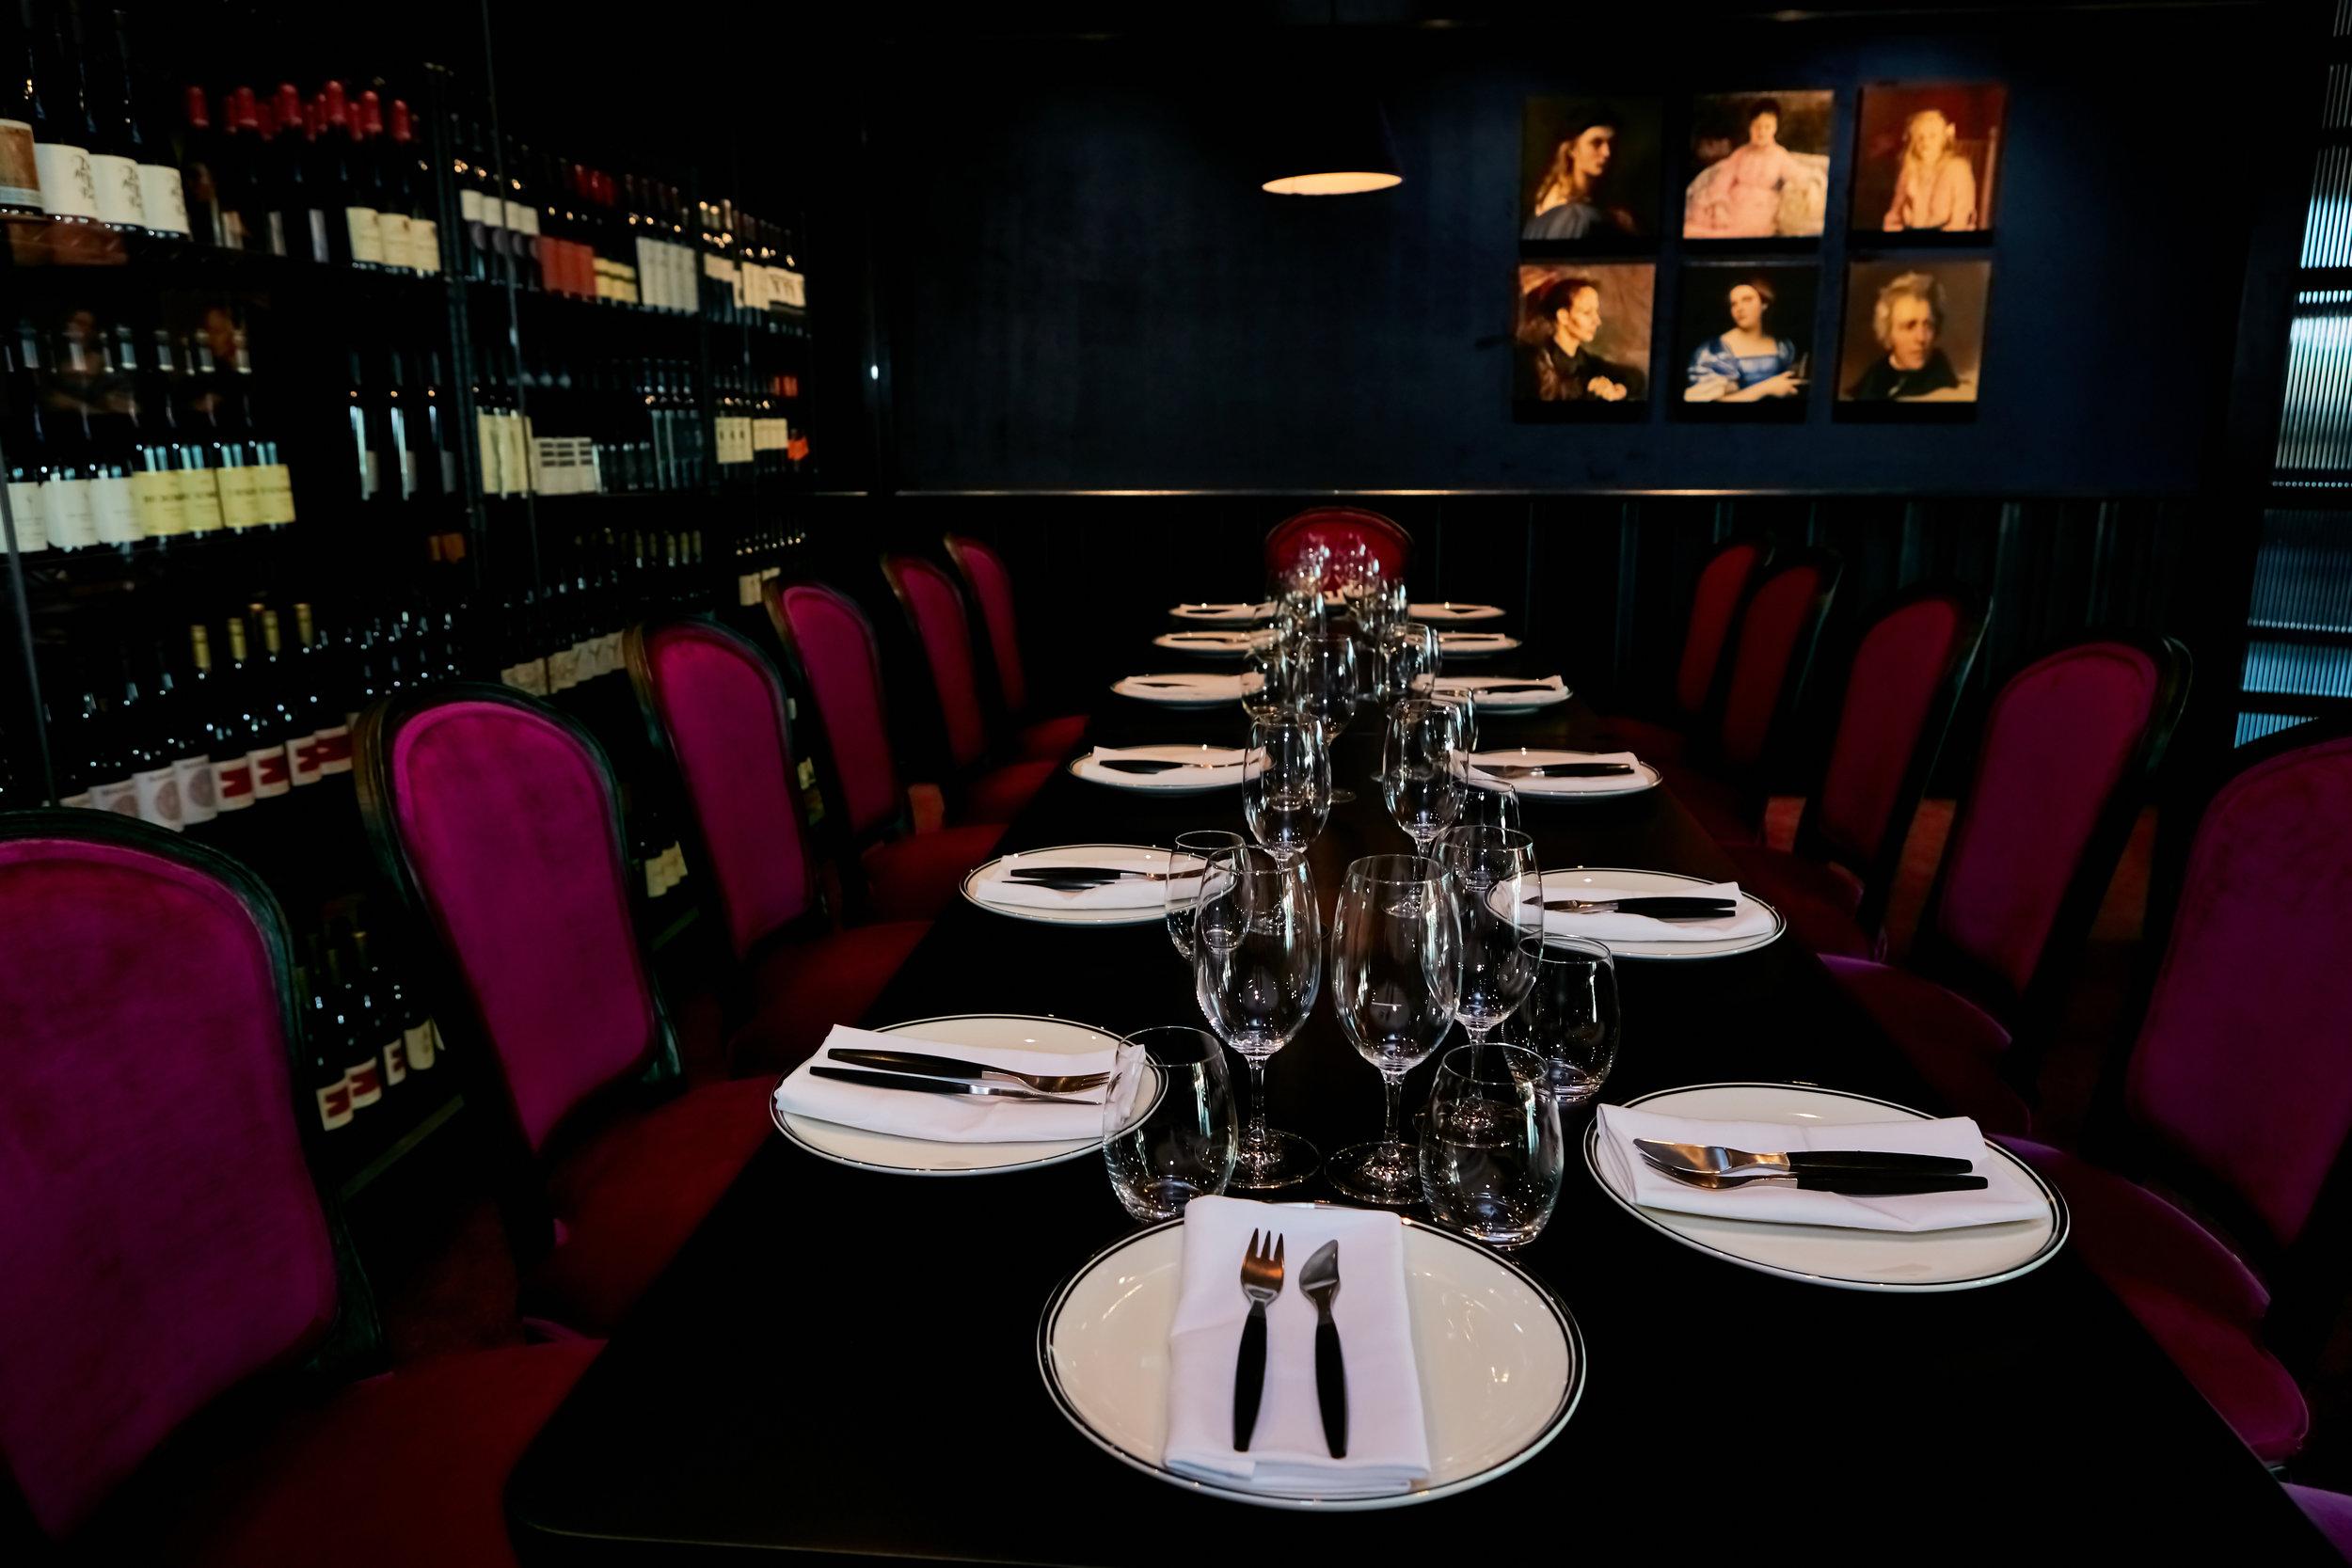 Heritij_Restaurant_Opening_Night_Brisbane, Mark_Buckley_Photogra